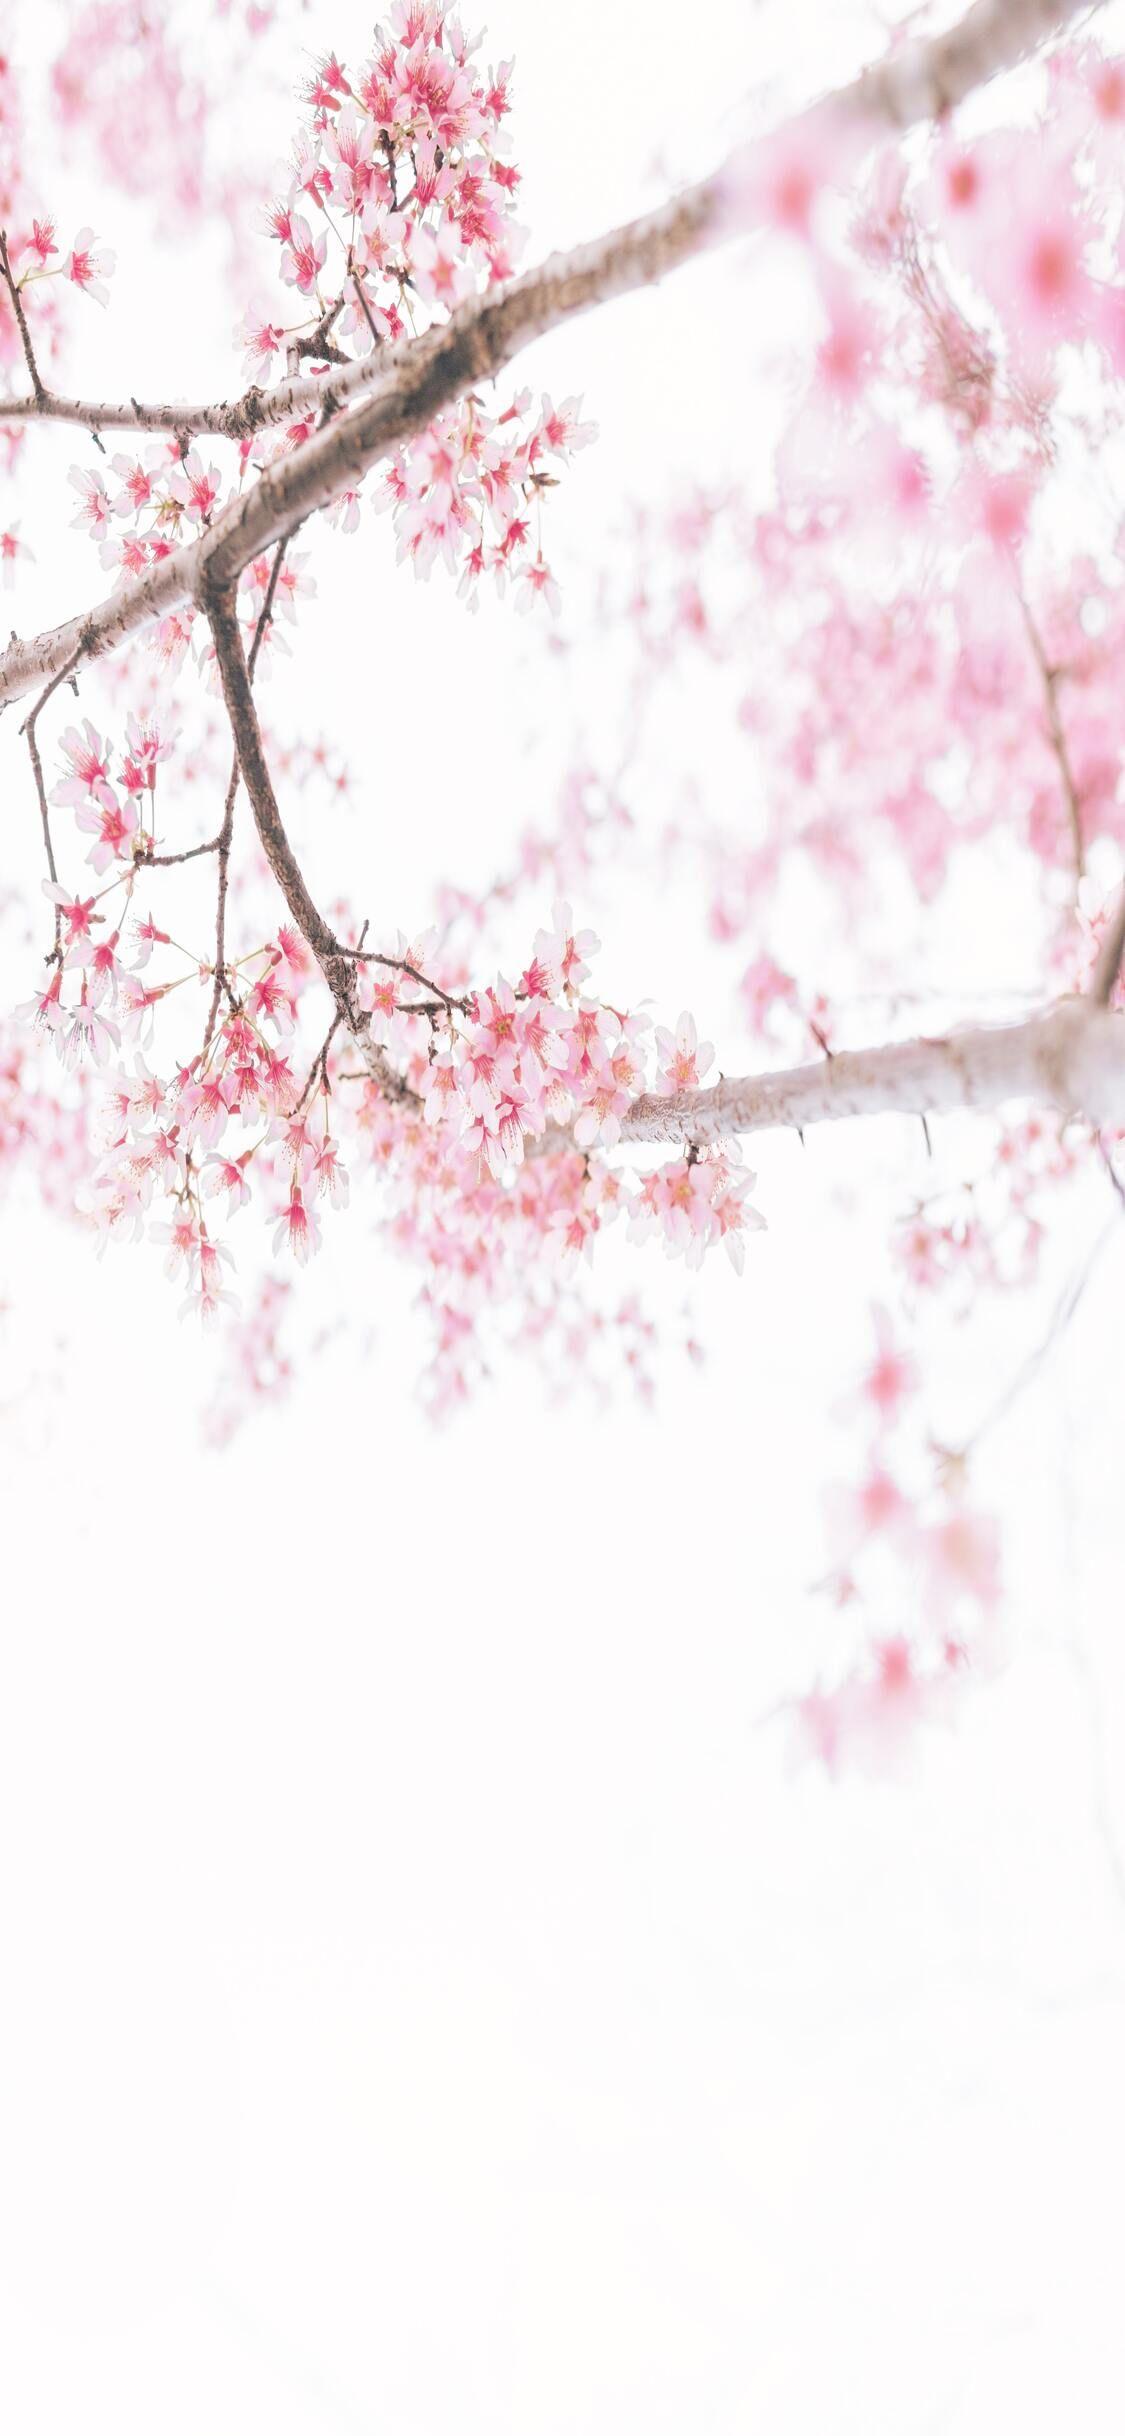 Top Spring Wallpaper 4k Hd In 2020 Spring Wallpaper Cherry Blossom Wallpaper Spring Flowers Background